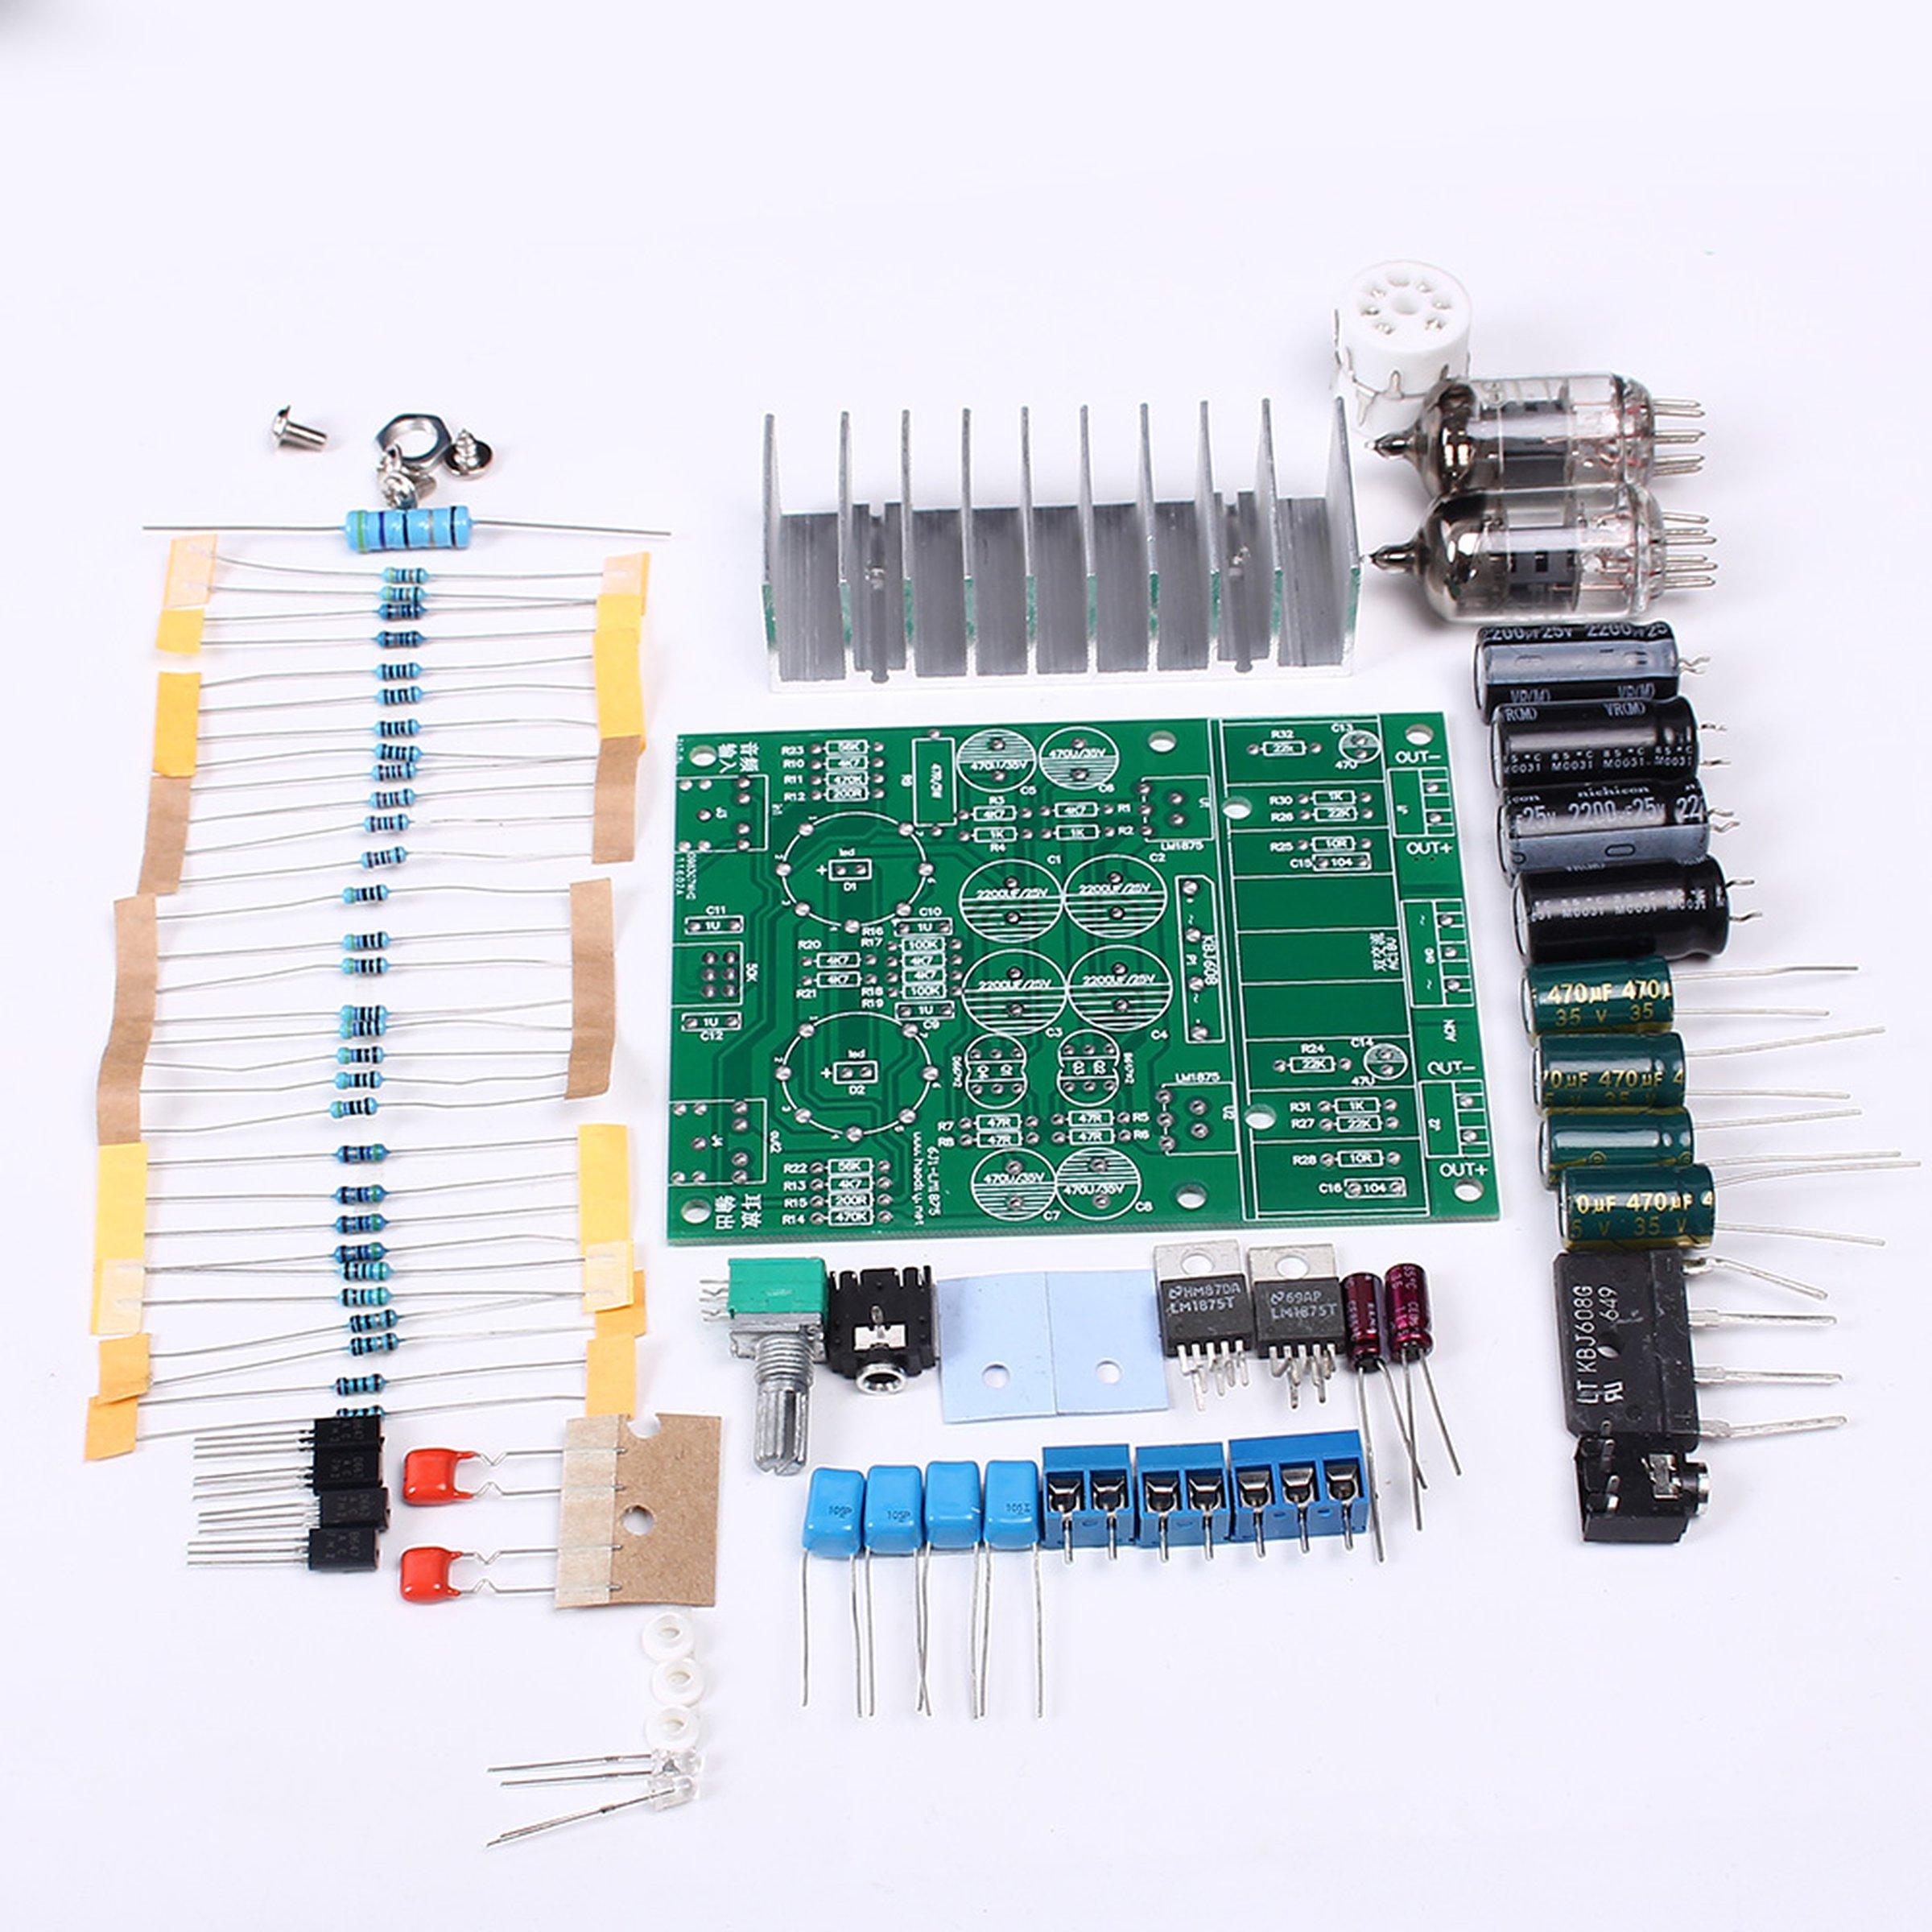 diy hybrid power amplifier board lm1875t 12008 from icstation on tindie. Black Bedroom Furniture Sets. Home Design Ideas